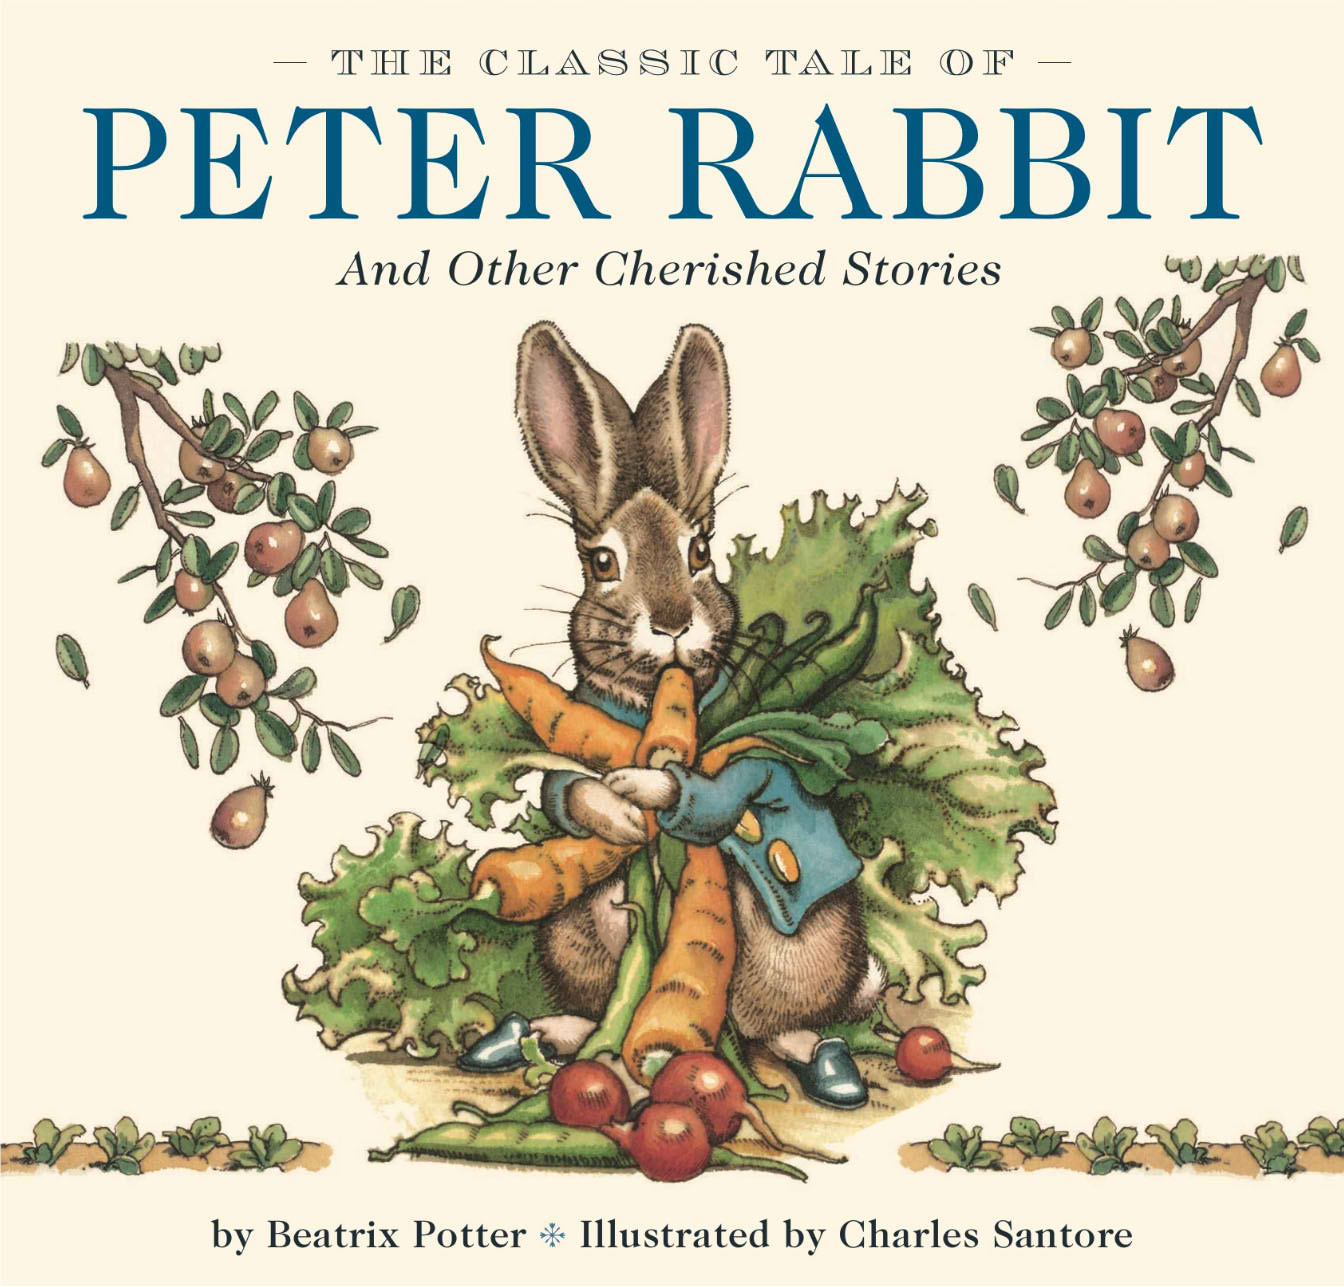 peterrabbit-book